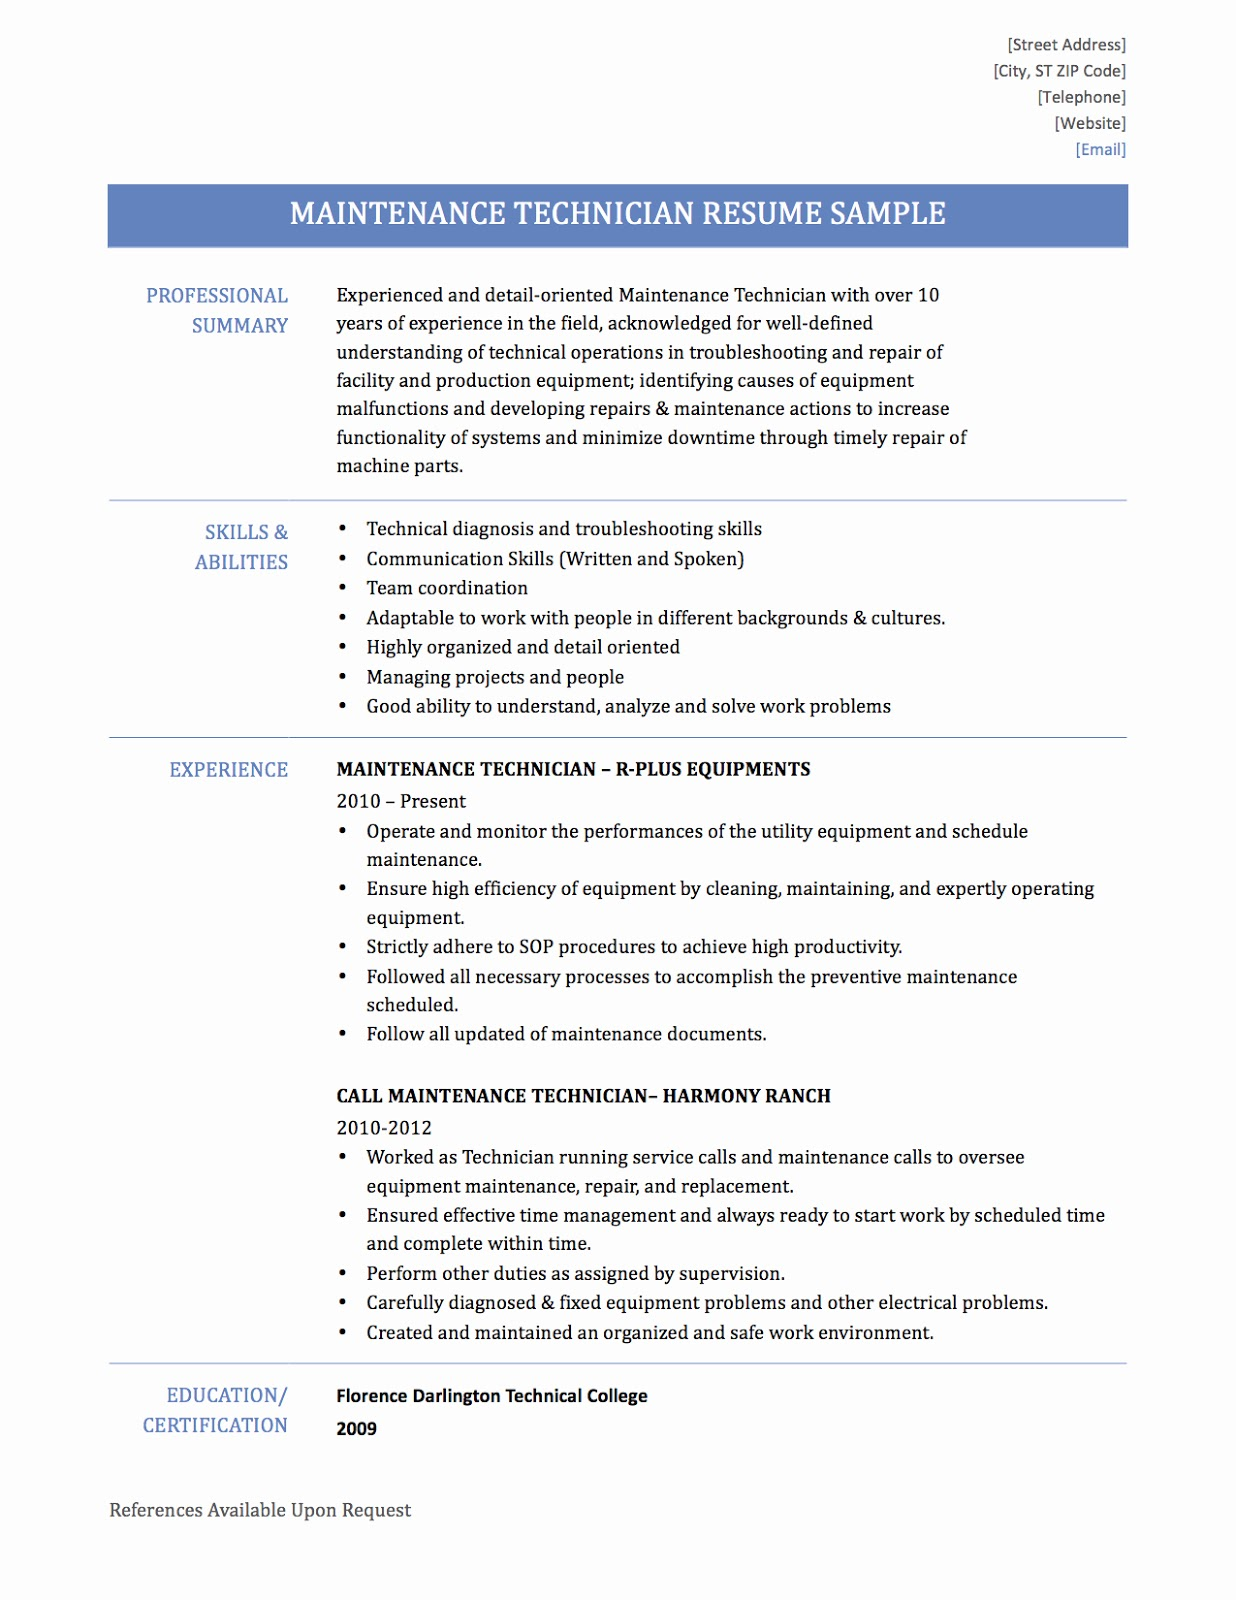 maintenance tech resume maintenance tech resume sample 2019 maintenance tech resume objective 2020, maintenance tech resume example maintenance technician resume template apartment maintenance tech resume industrial